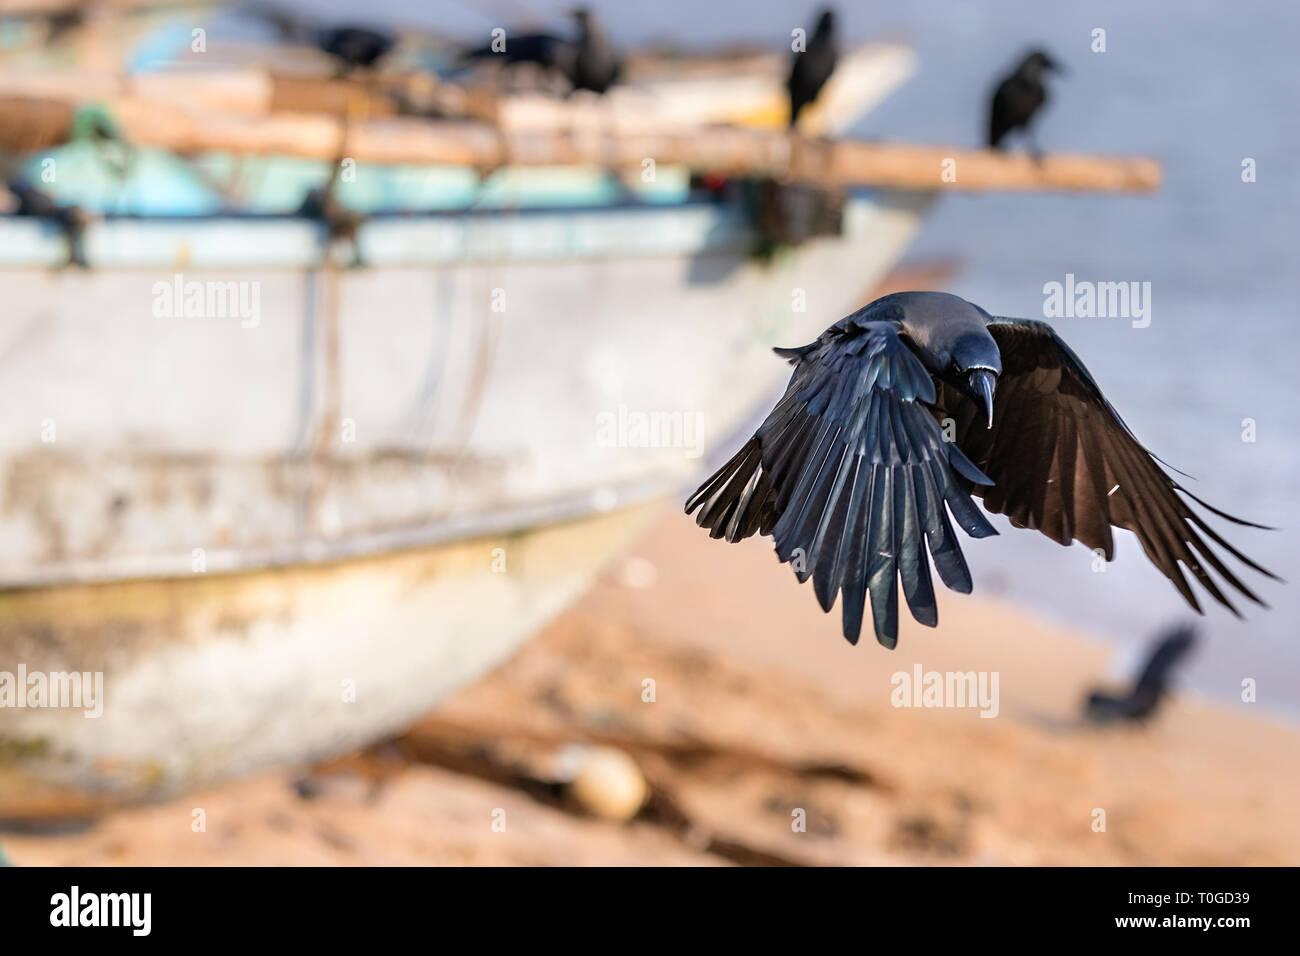 A black raven bird landing in the beach in Galle, Sri Lanka. - Stock Image